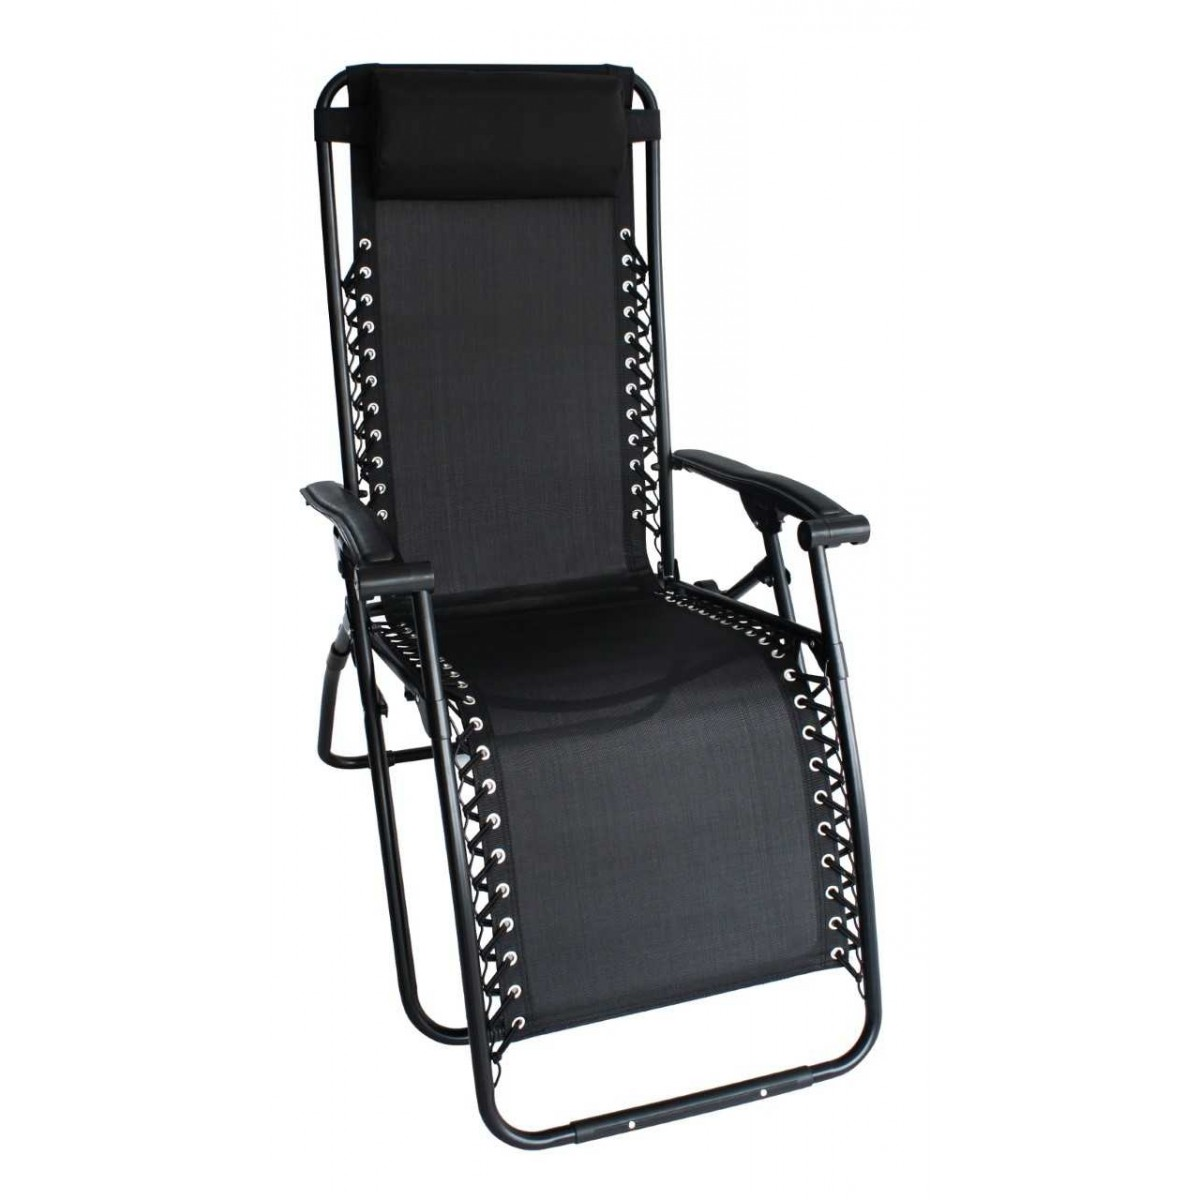 LAZY Relax stol i sort textilene